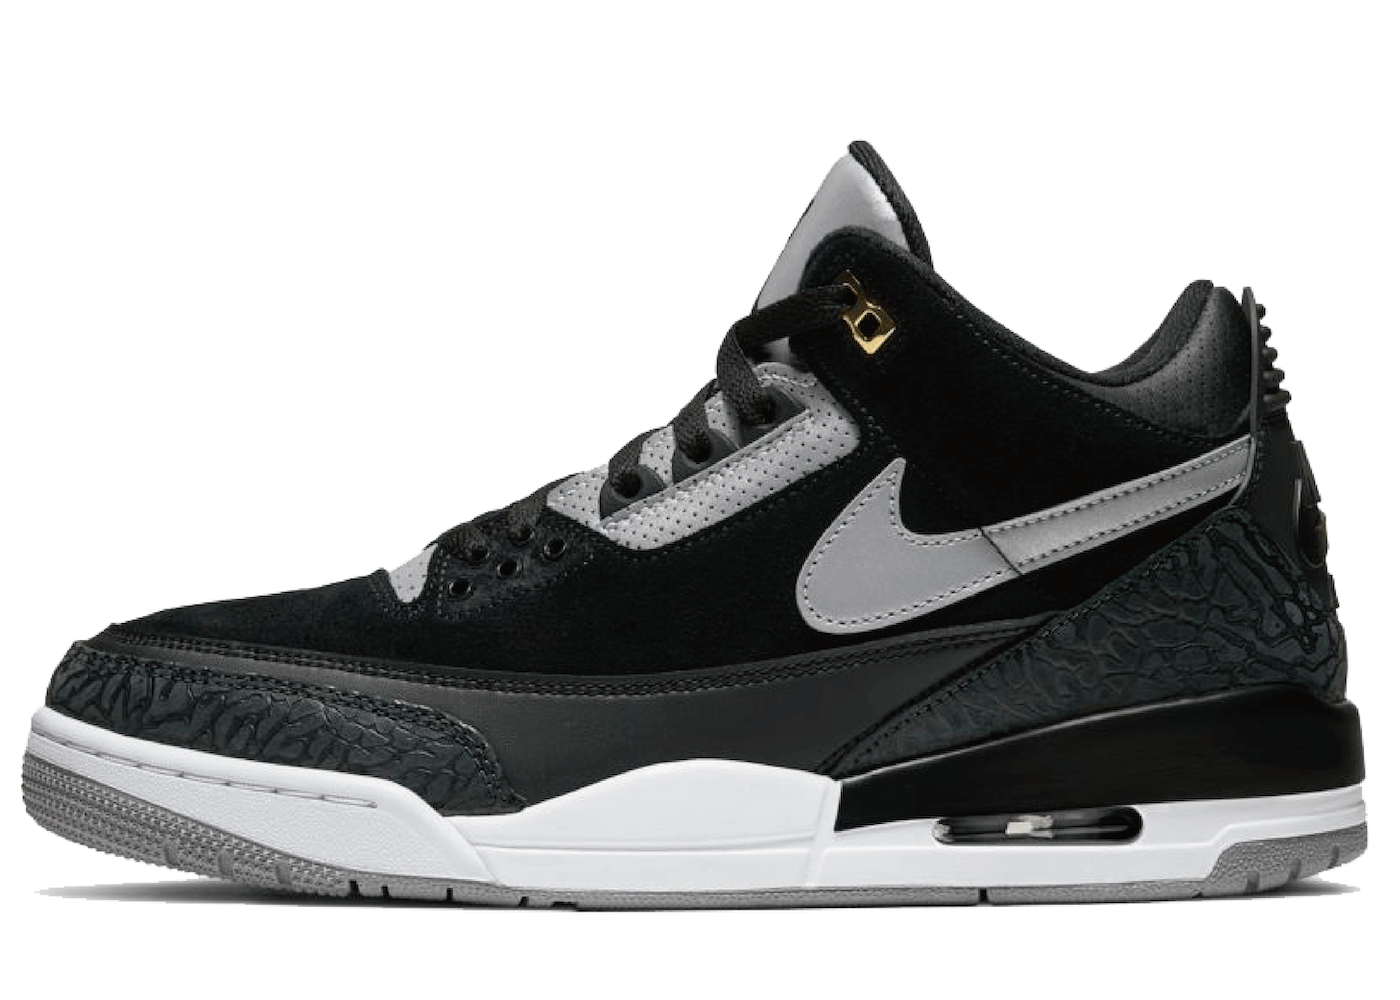 Nike Air Jordan 3 Tinker Black Cementの写真